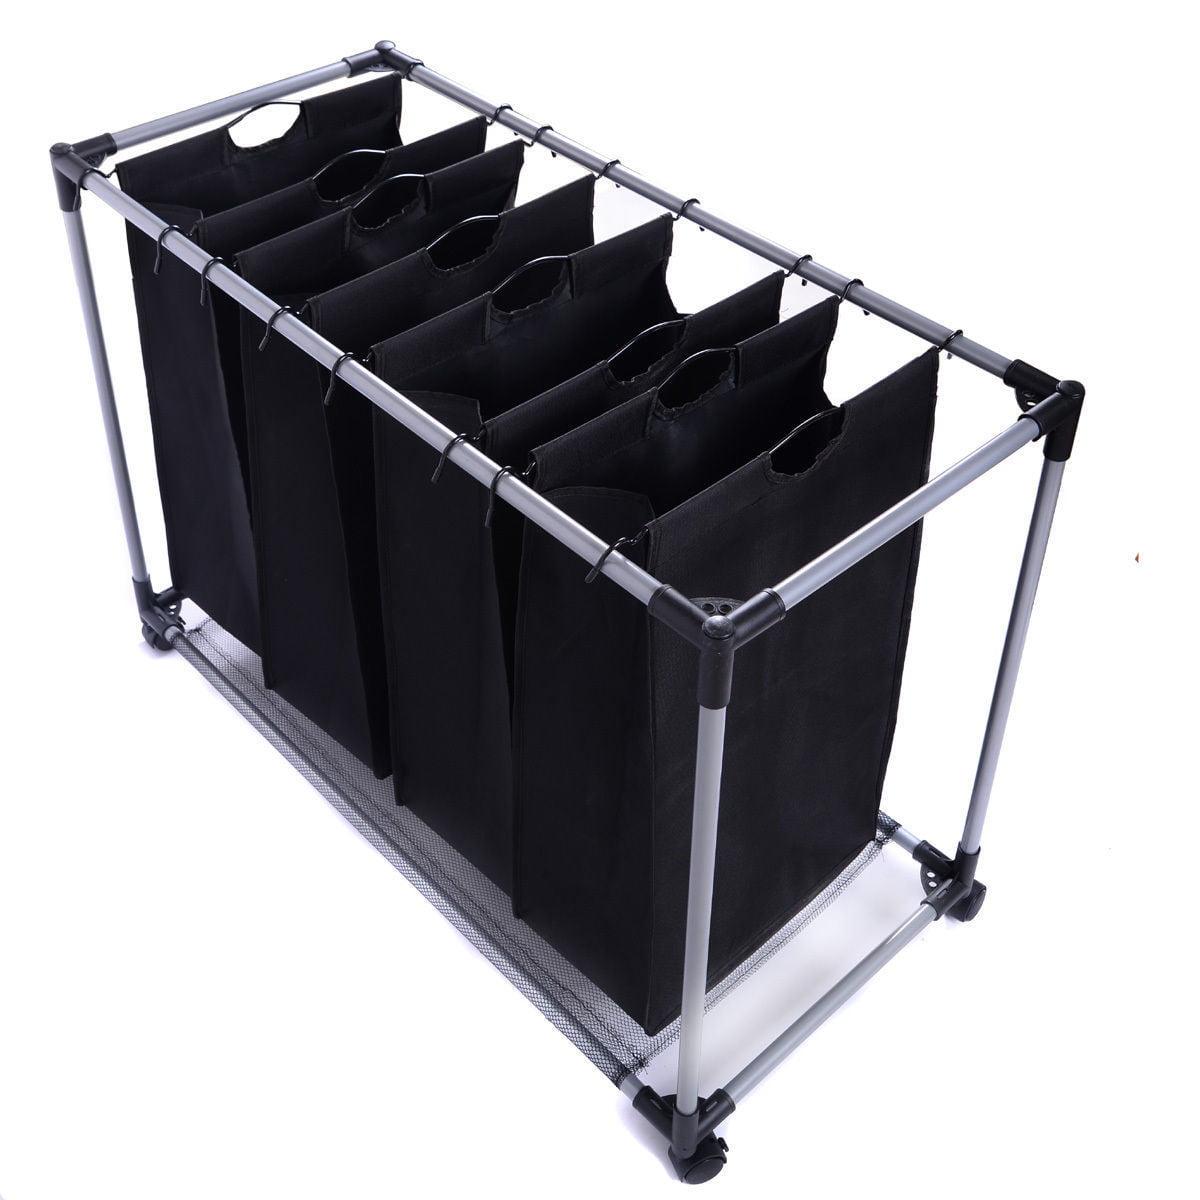 Black Heavy-Duty 4-Bag Laundry Sorter Hamper Clothes Organizer by